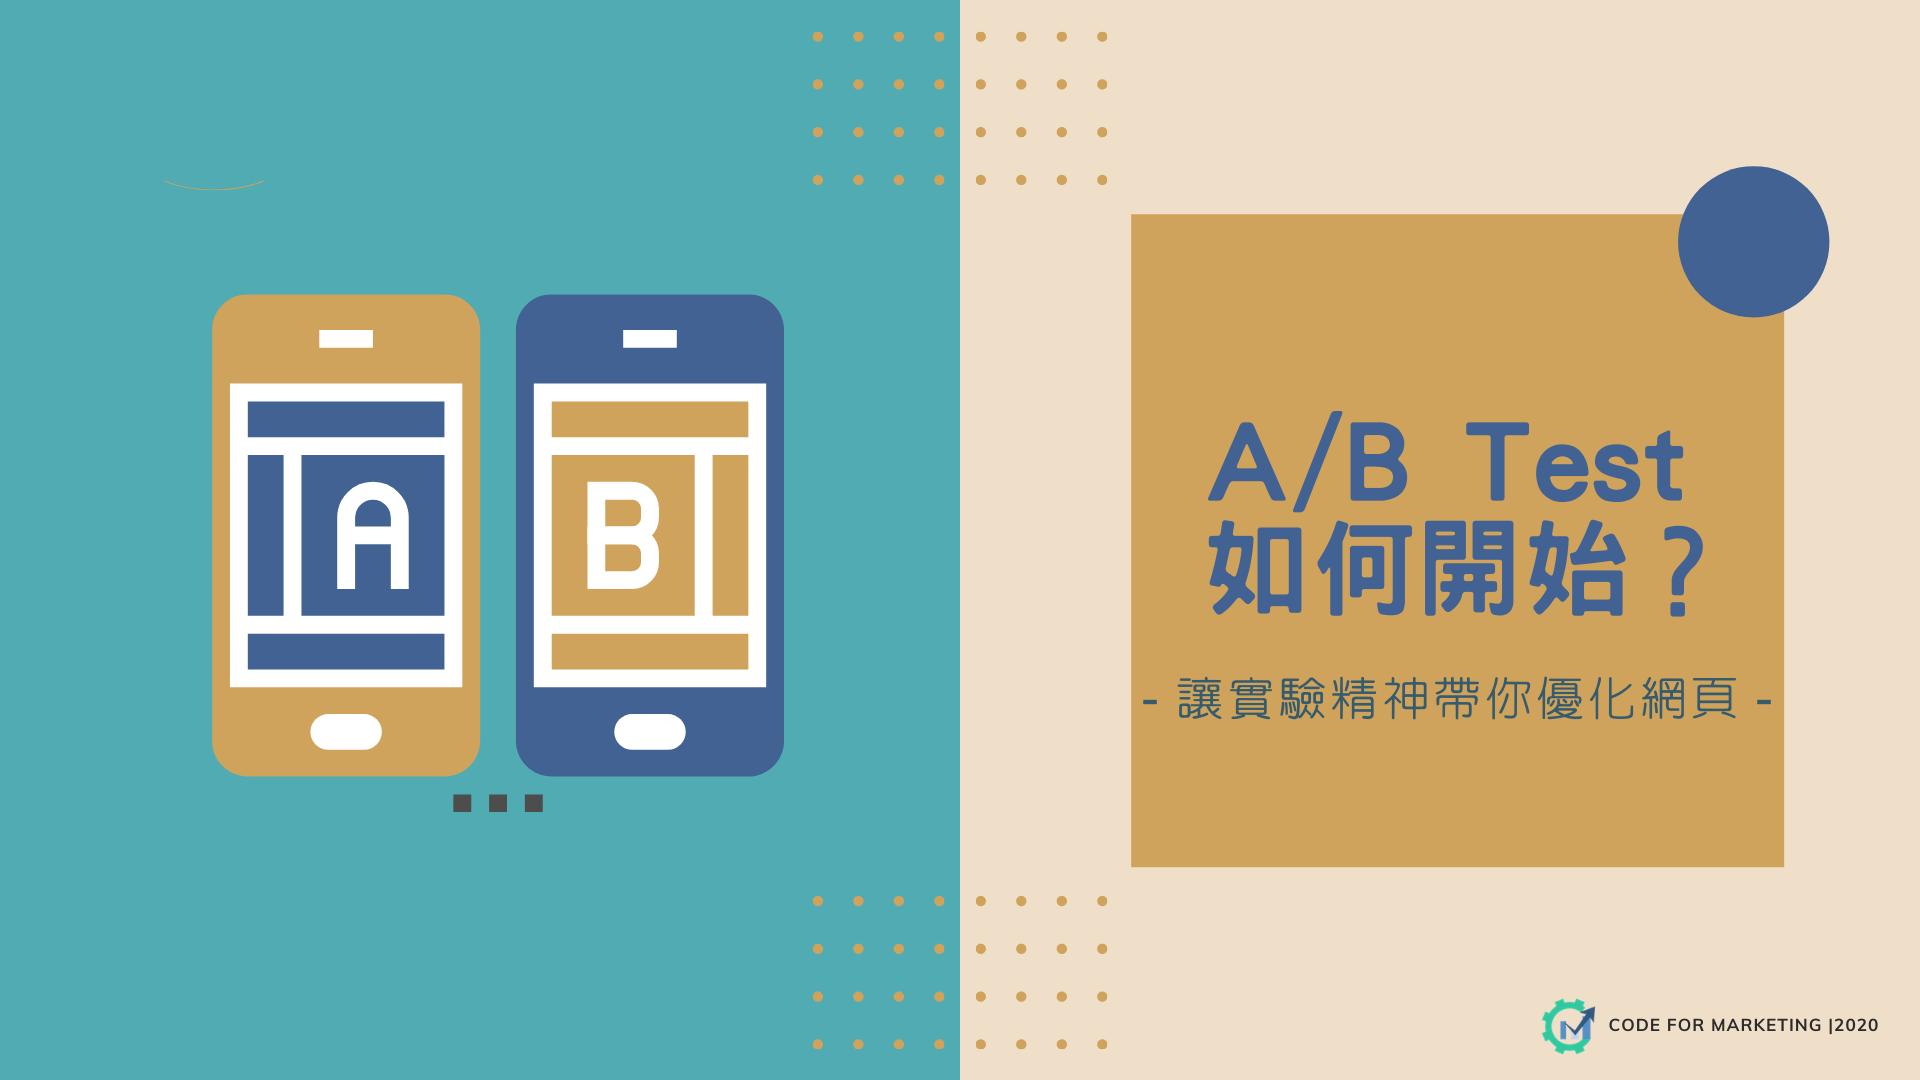 Protected: A/B Test入門懶人包:讓實驗精神帶你優化網站!